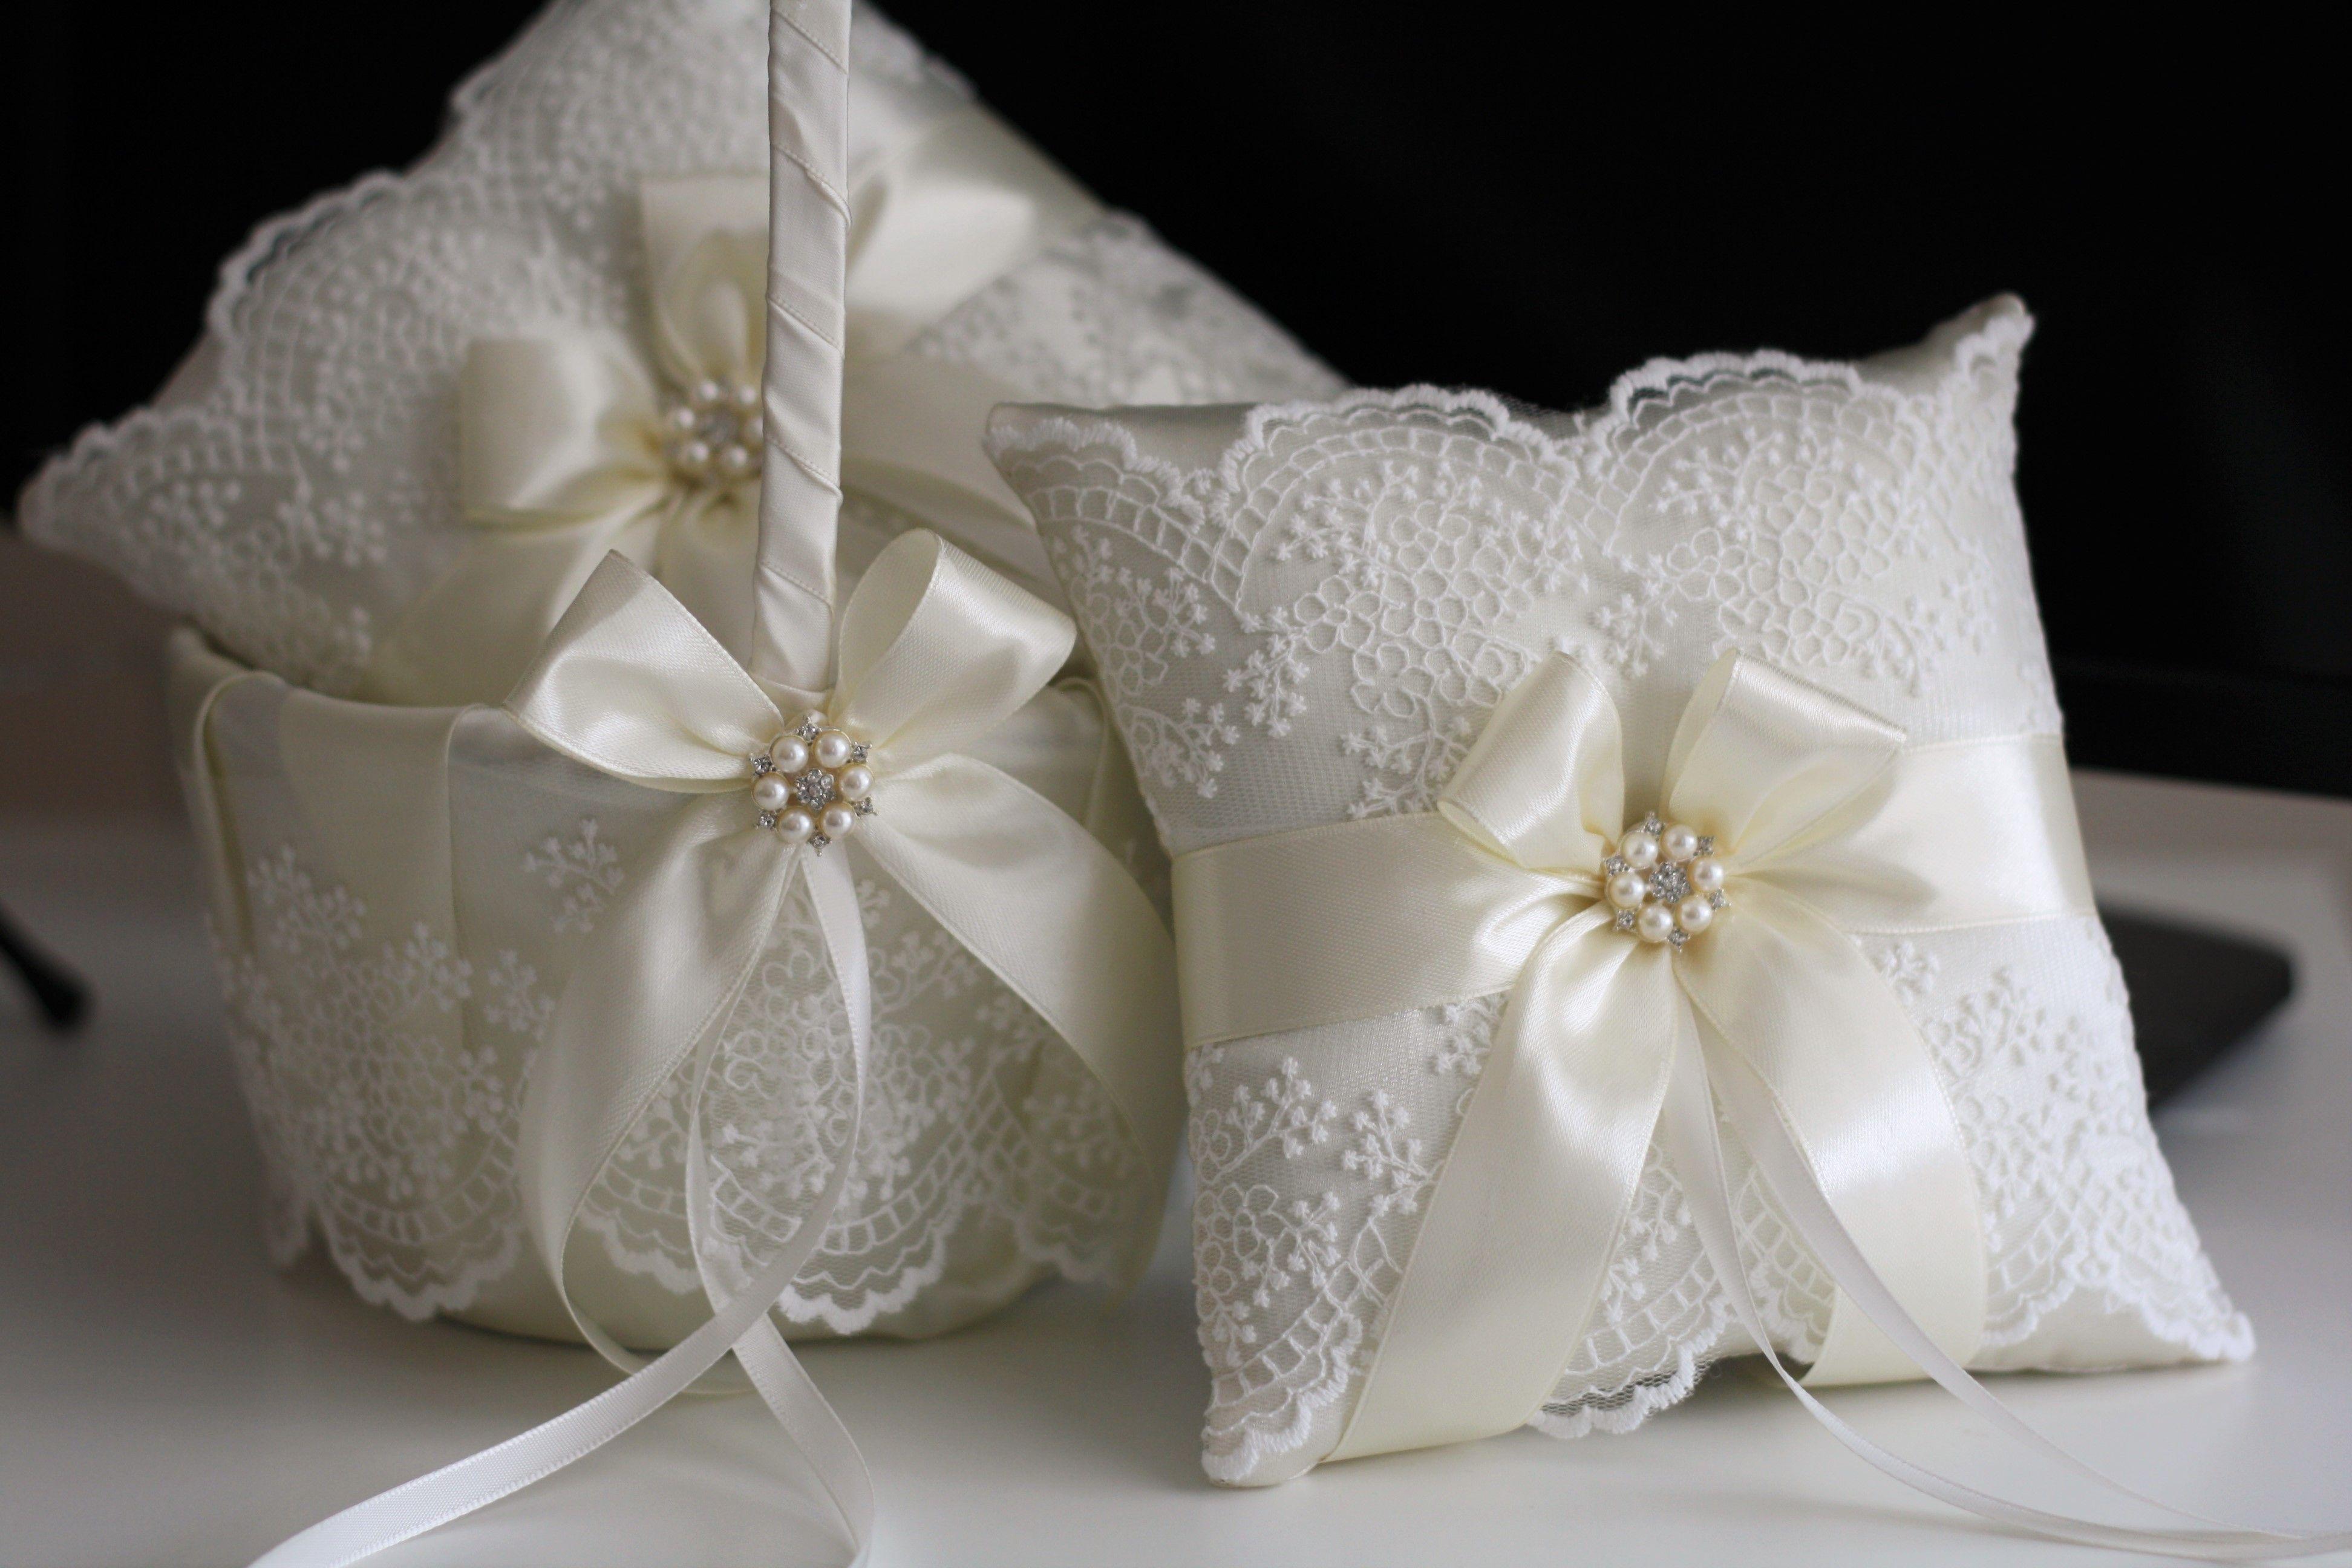 Buy a Handmade Ivory Lace Flower Girl Basket And Ring Bearer